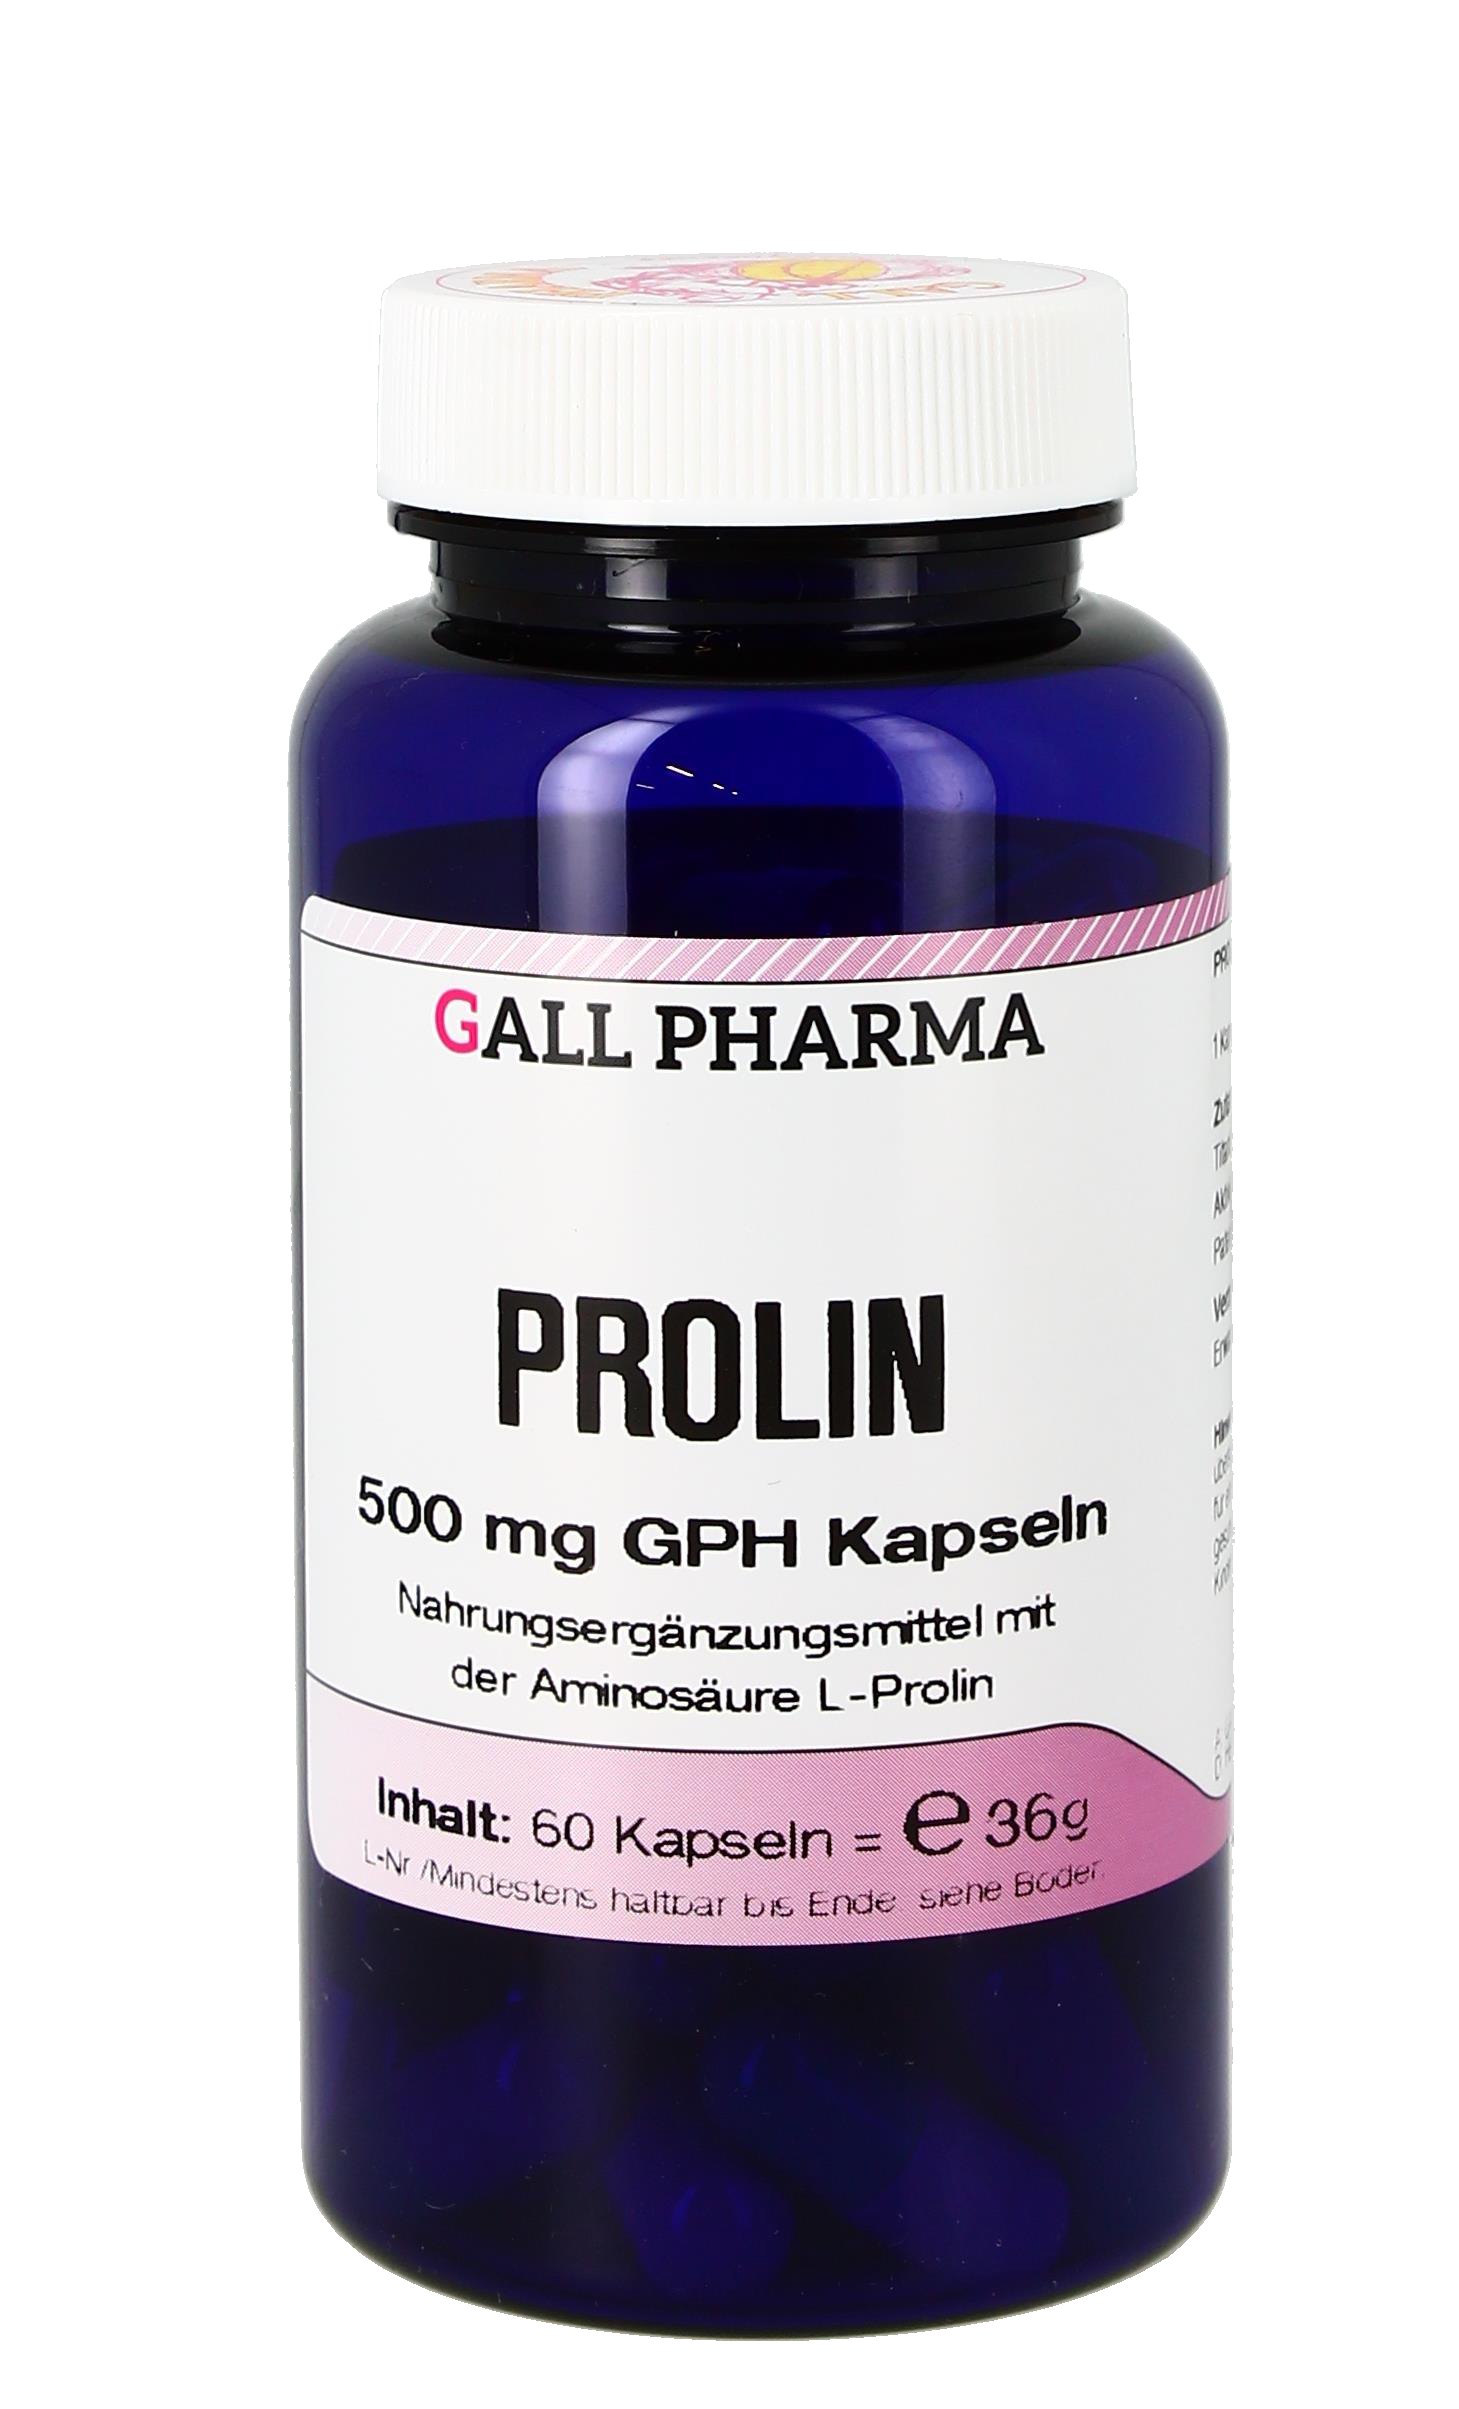 Prolin 500 mg GPH Kapseln